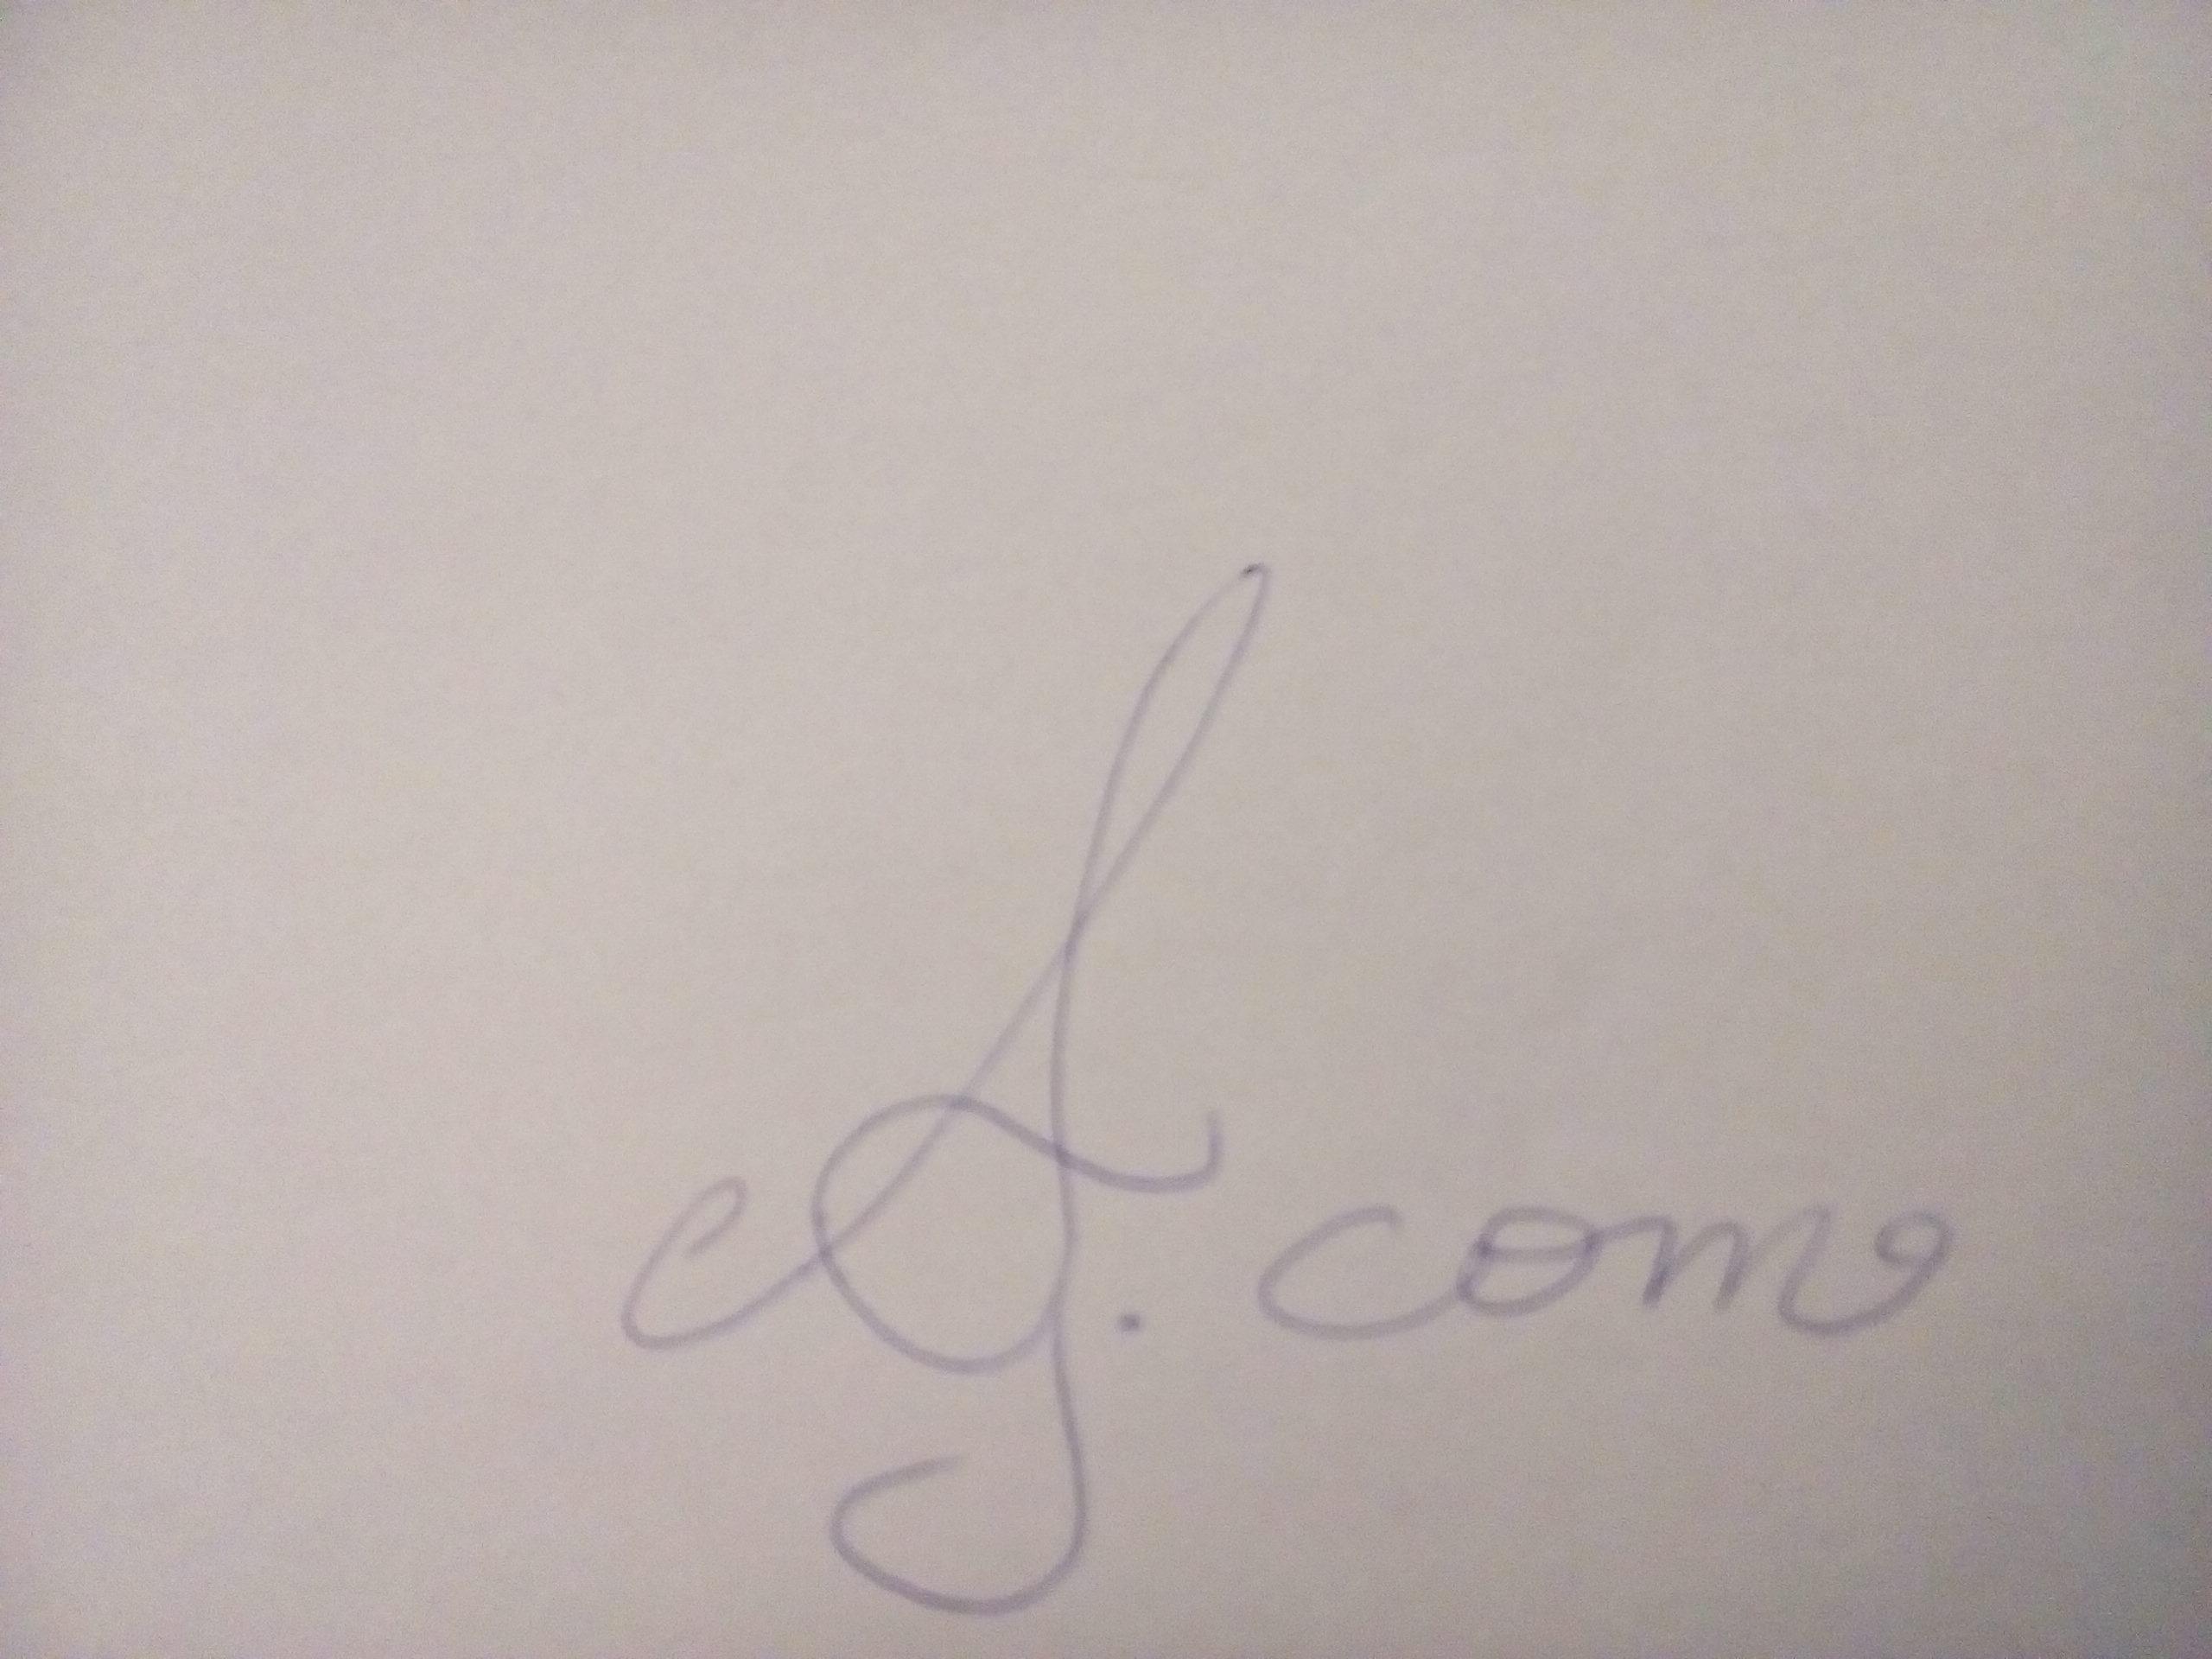 ANASTASIA GIANNOPOULOU's Signature